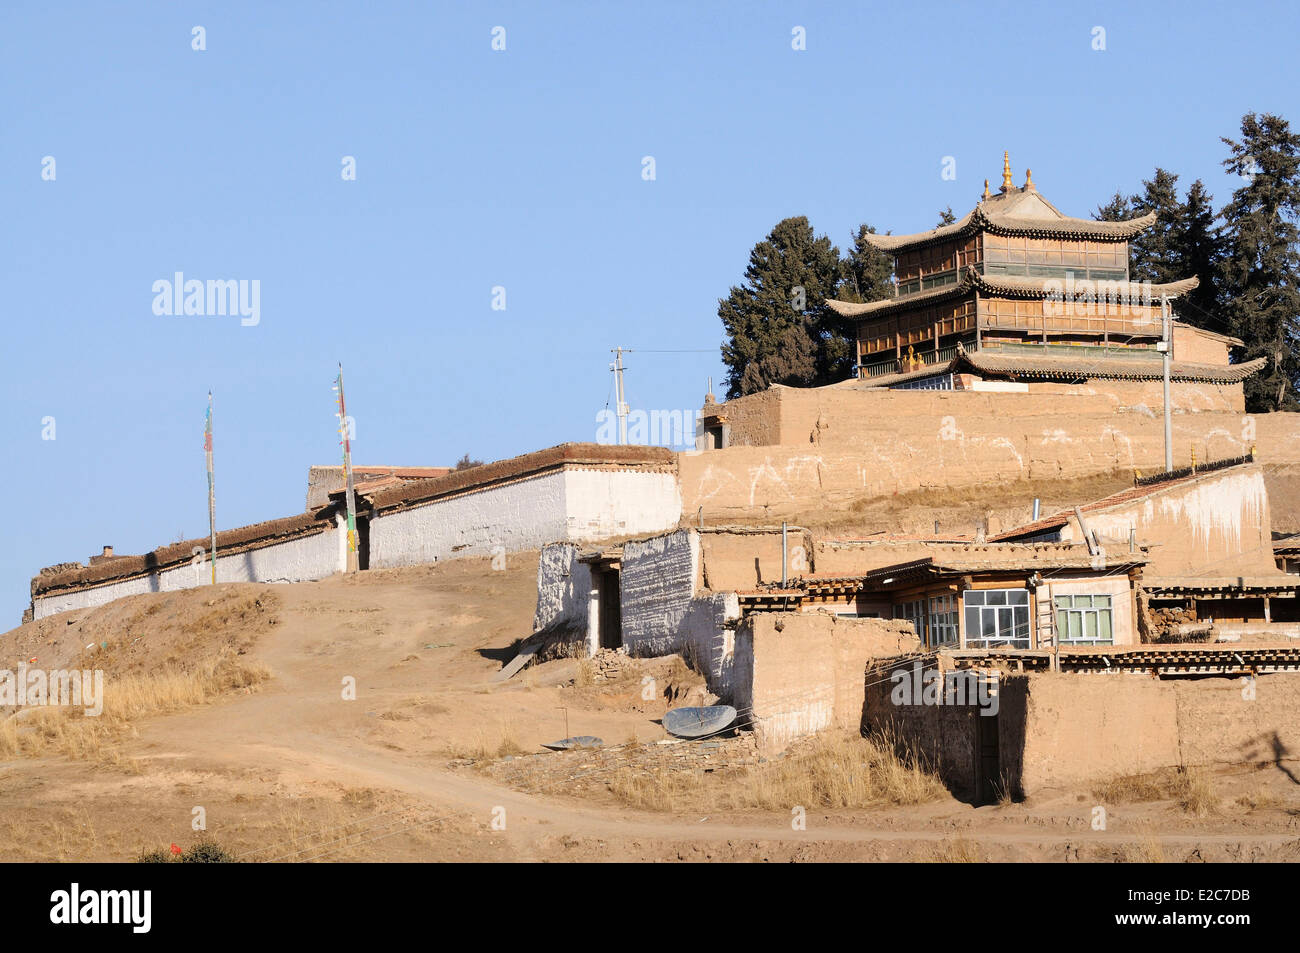 Cina, Provincia di Qinghai, Amdo, Tongren (Rebkong) contea, Tashi Kyil monastero Immagini Stock